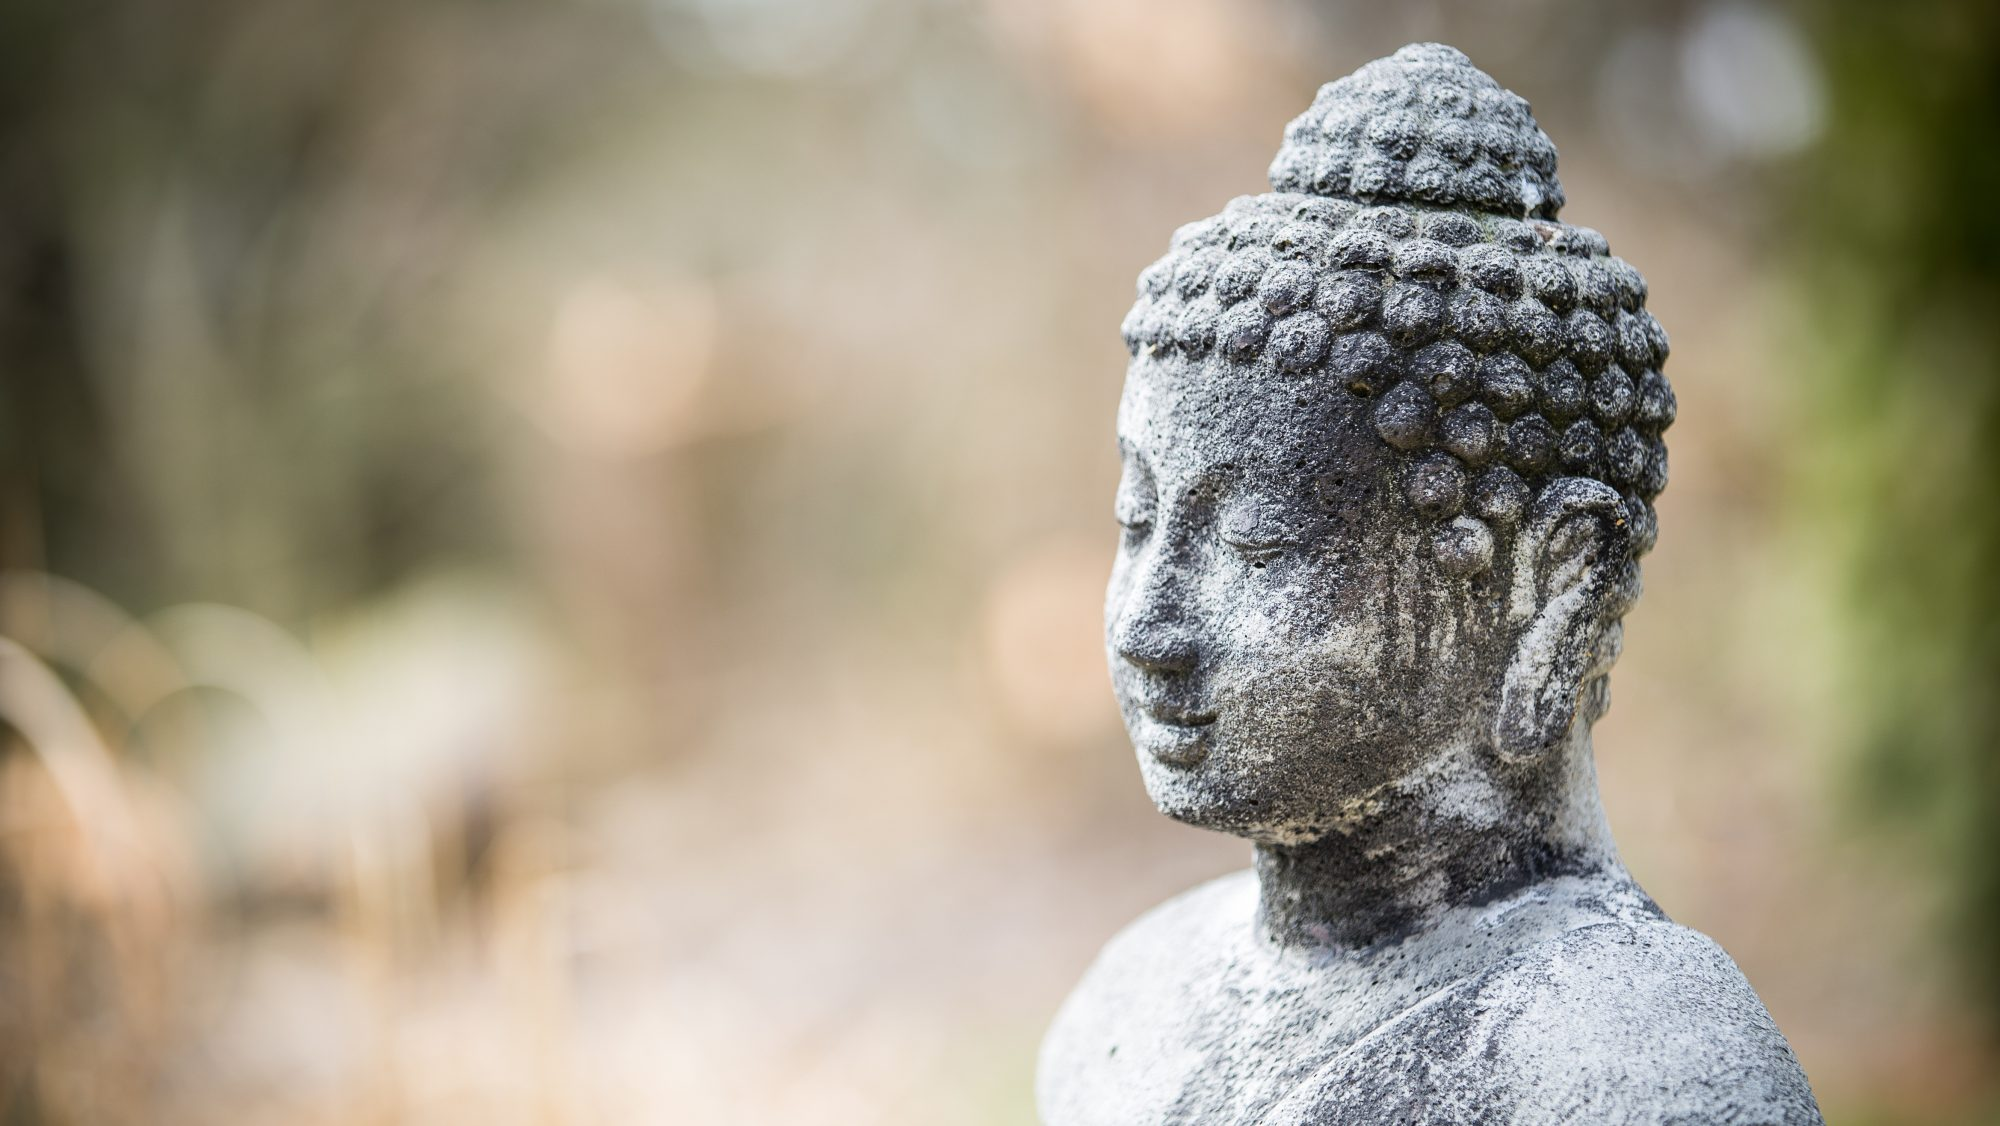 Qi Gong - Der Weg von den 10.000 Dingen zum Kern unserer Lebenssubstanz